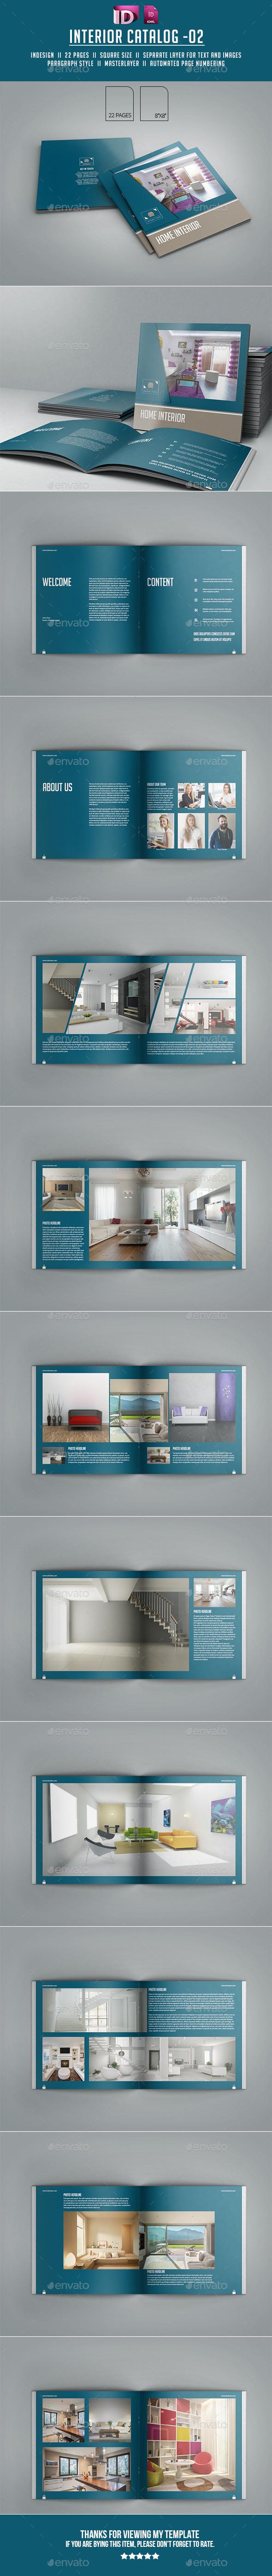 GraphicRiver Interior Catalog 02 11827117